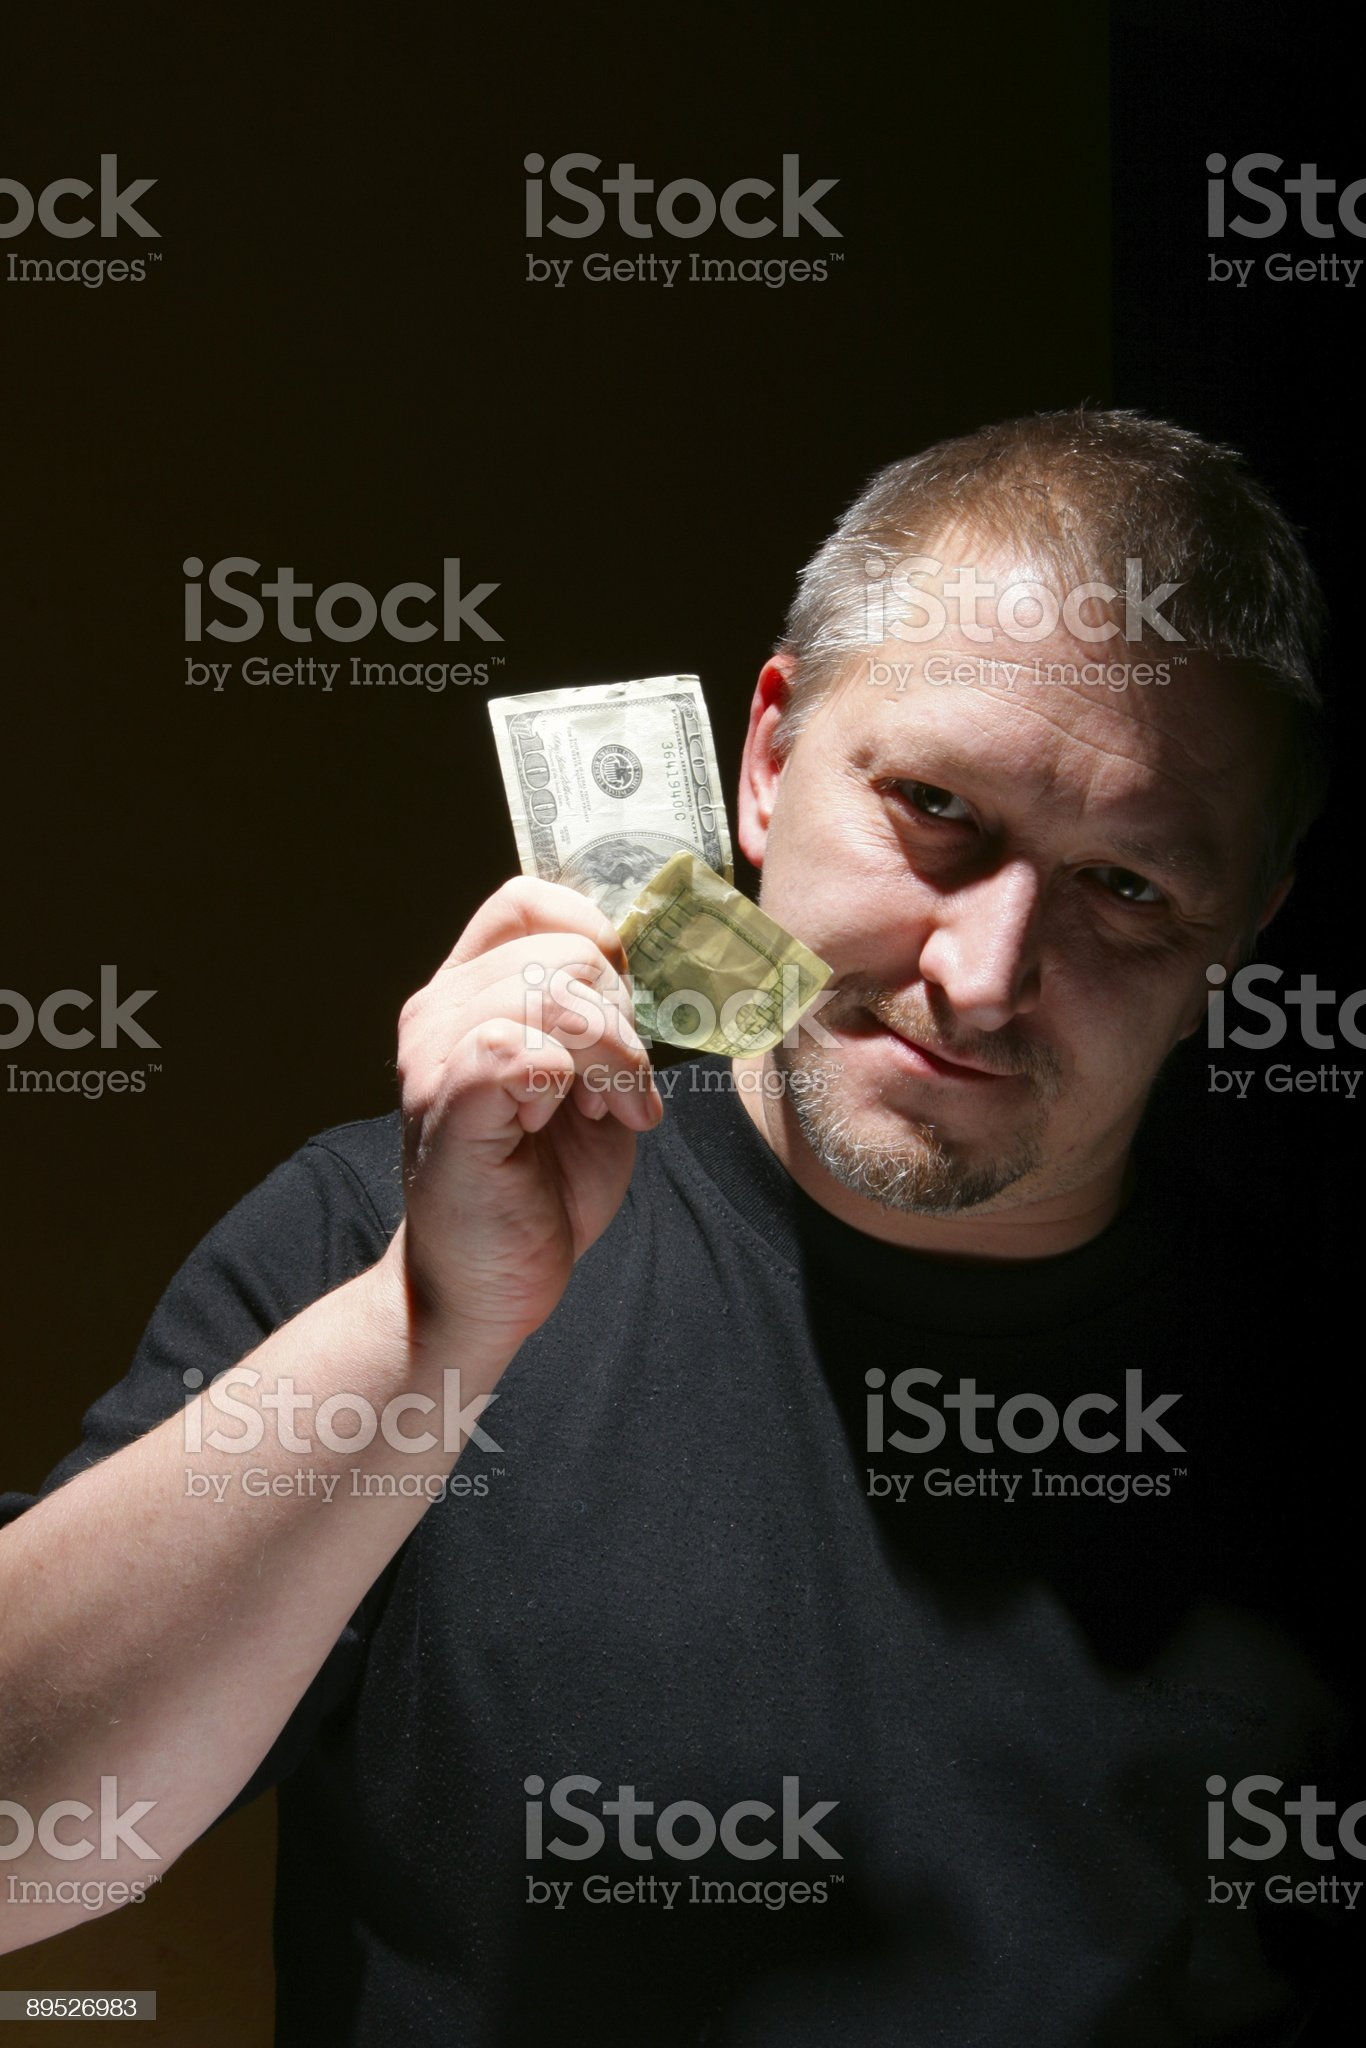 Man offering money royalty-free stock photo